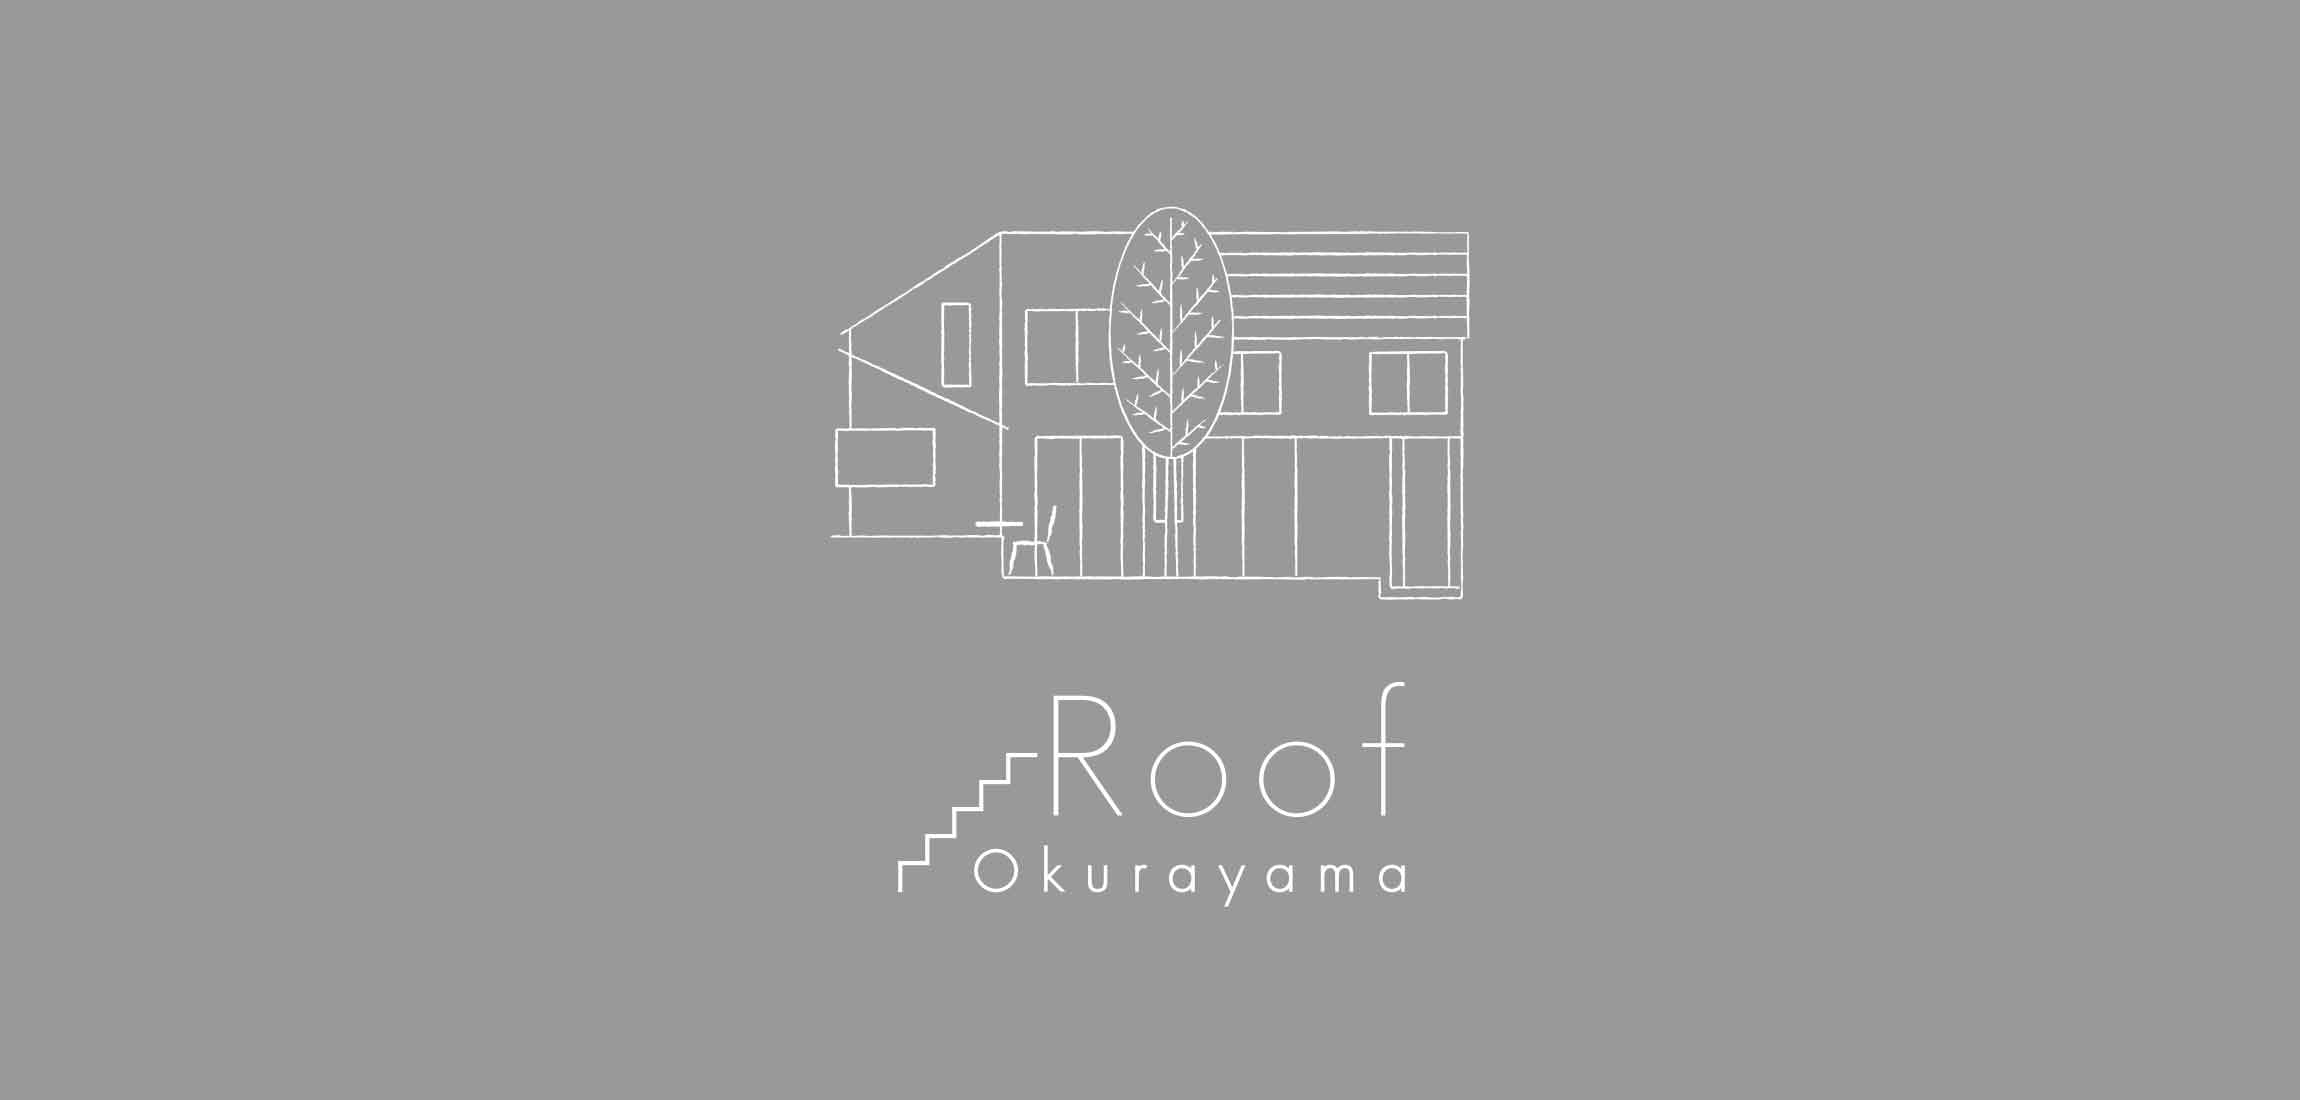 Roof Okurayama | カフェ | ロゴ・ロゴマーク